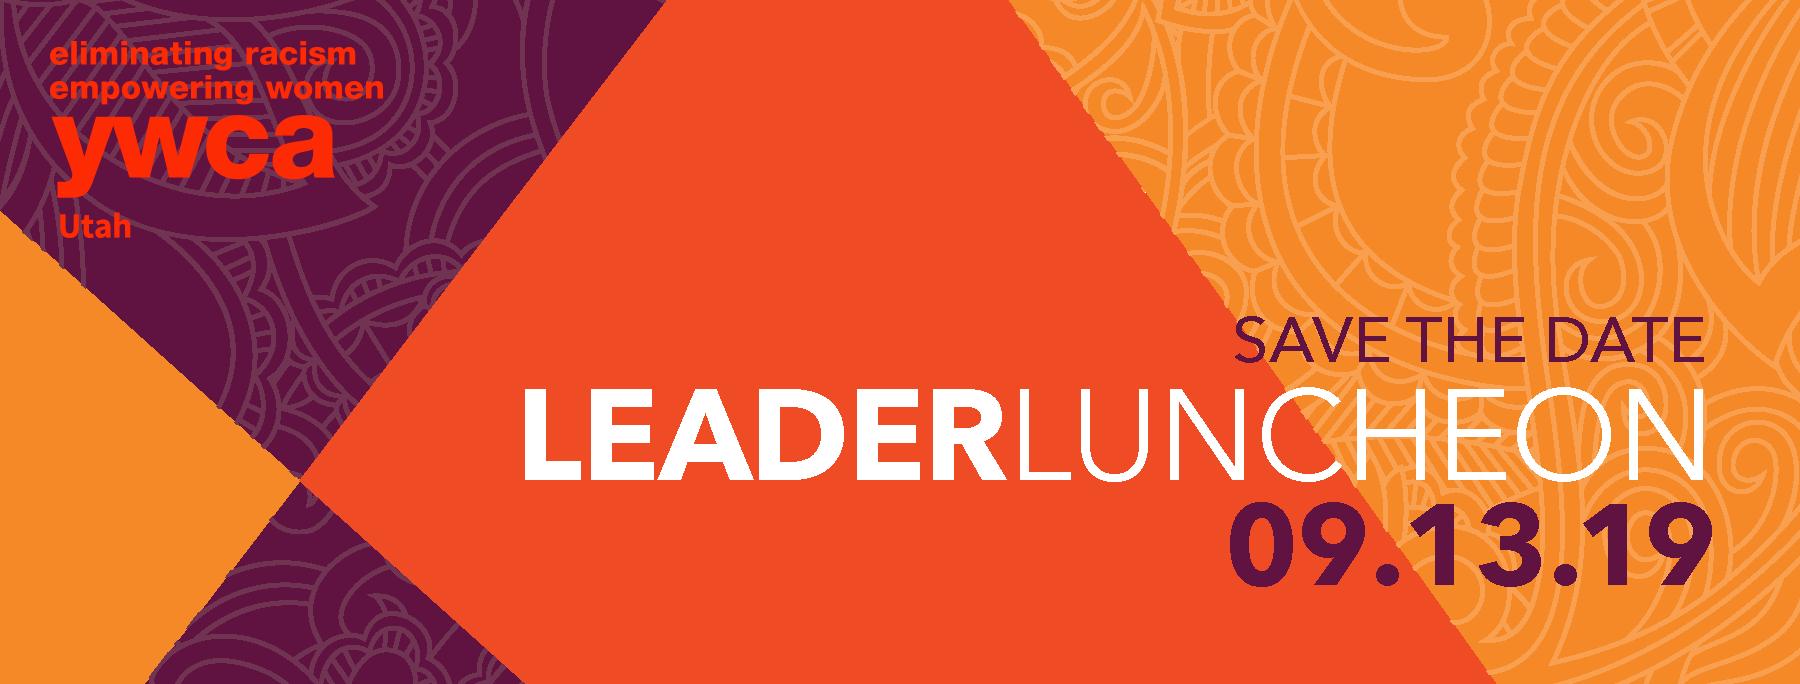 YWCA Utah LeaderLuncheon